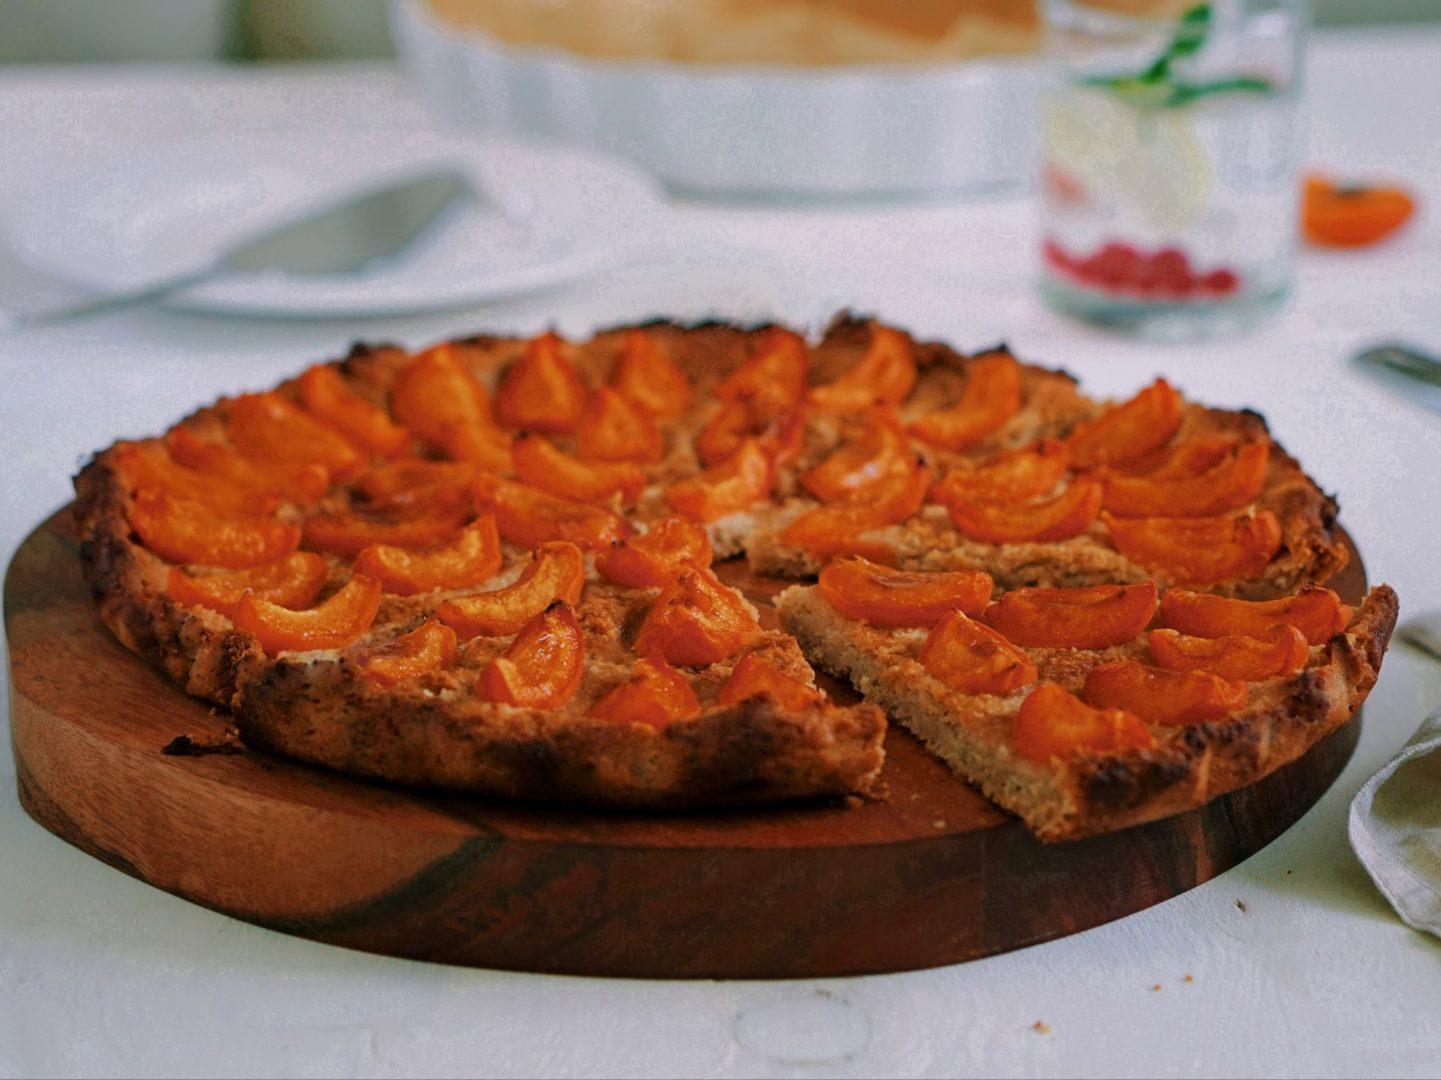 Marhuľový koláč bez lepku abieleho cukru